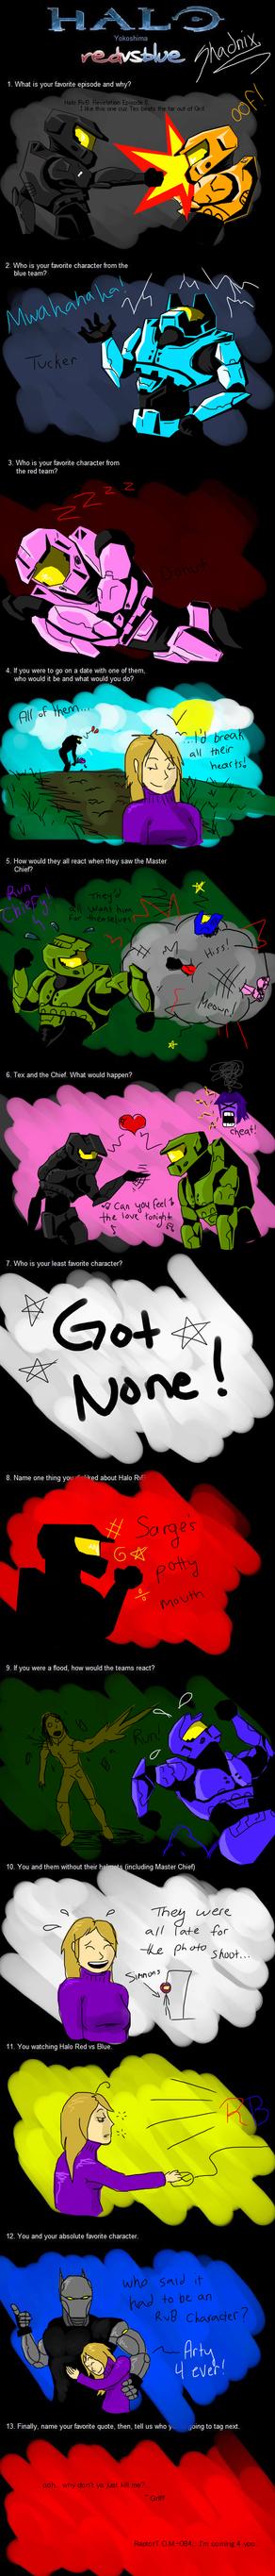 Halo RvB Meme by Shadnix